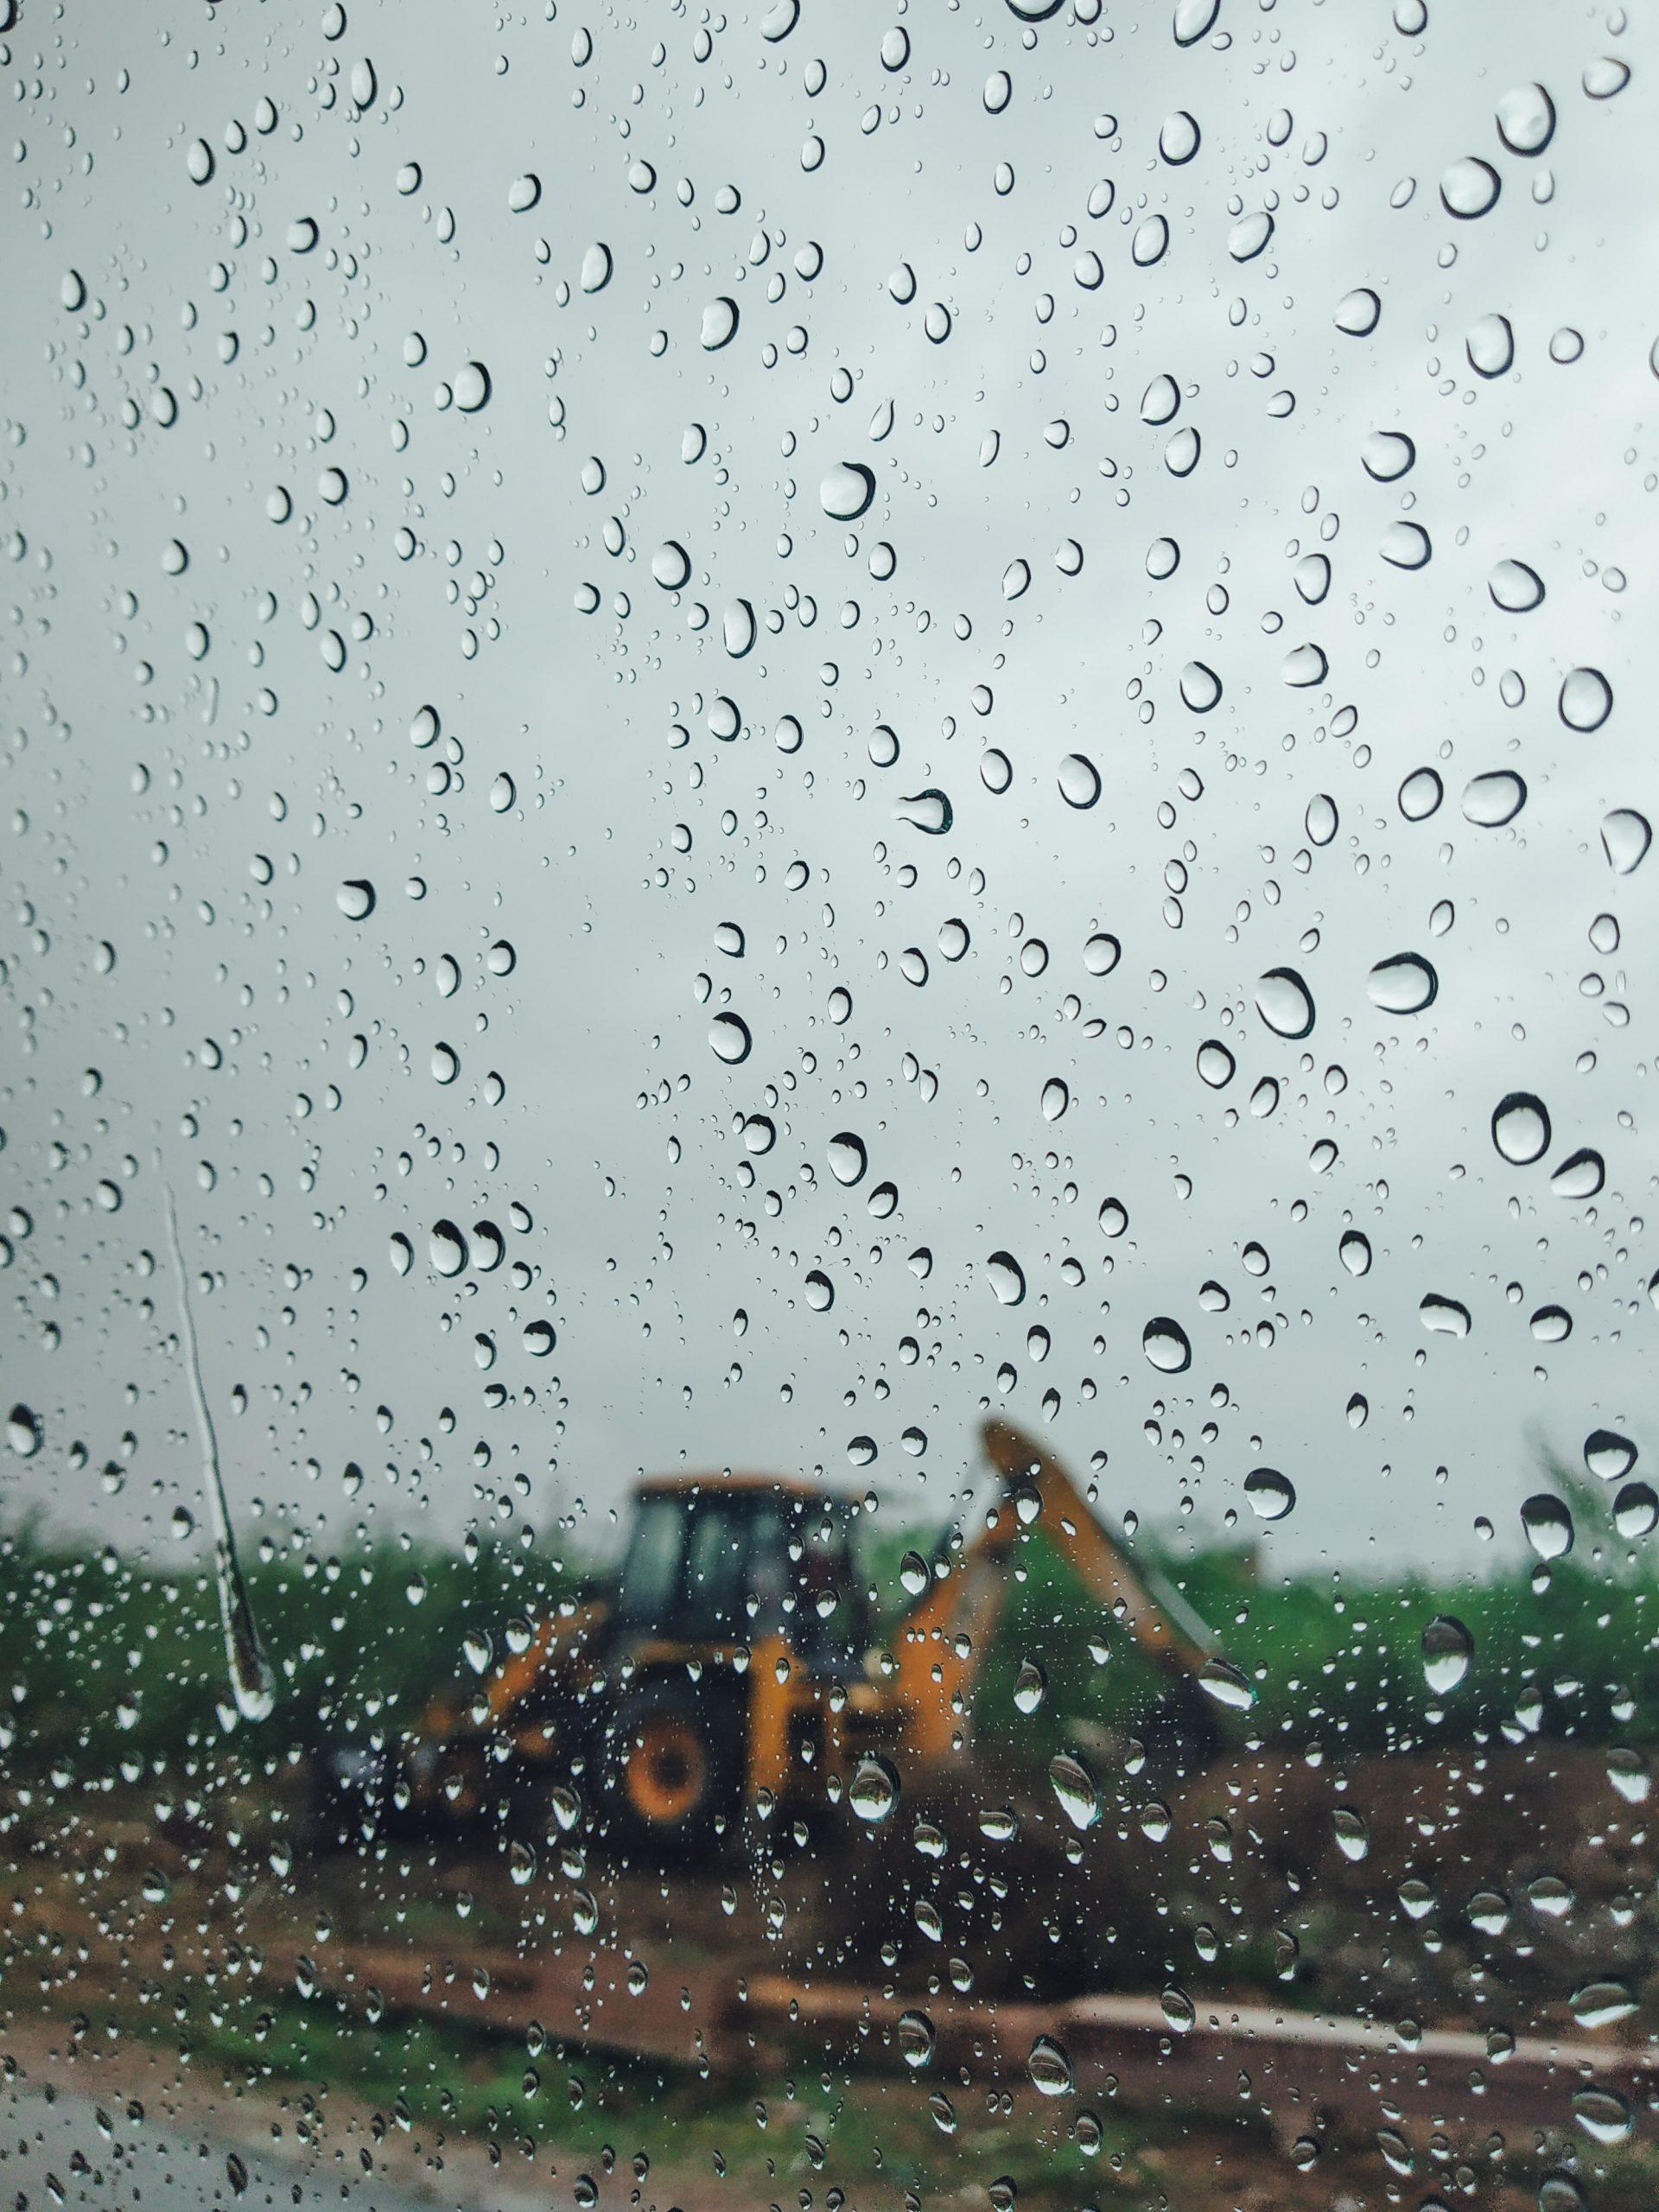 Rain drops on car window glass